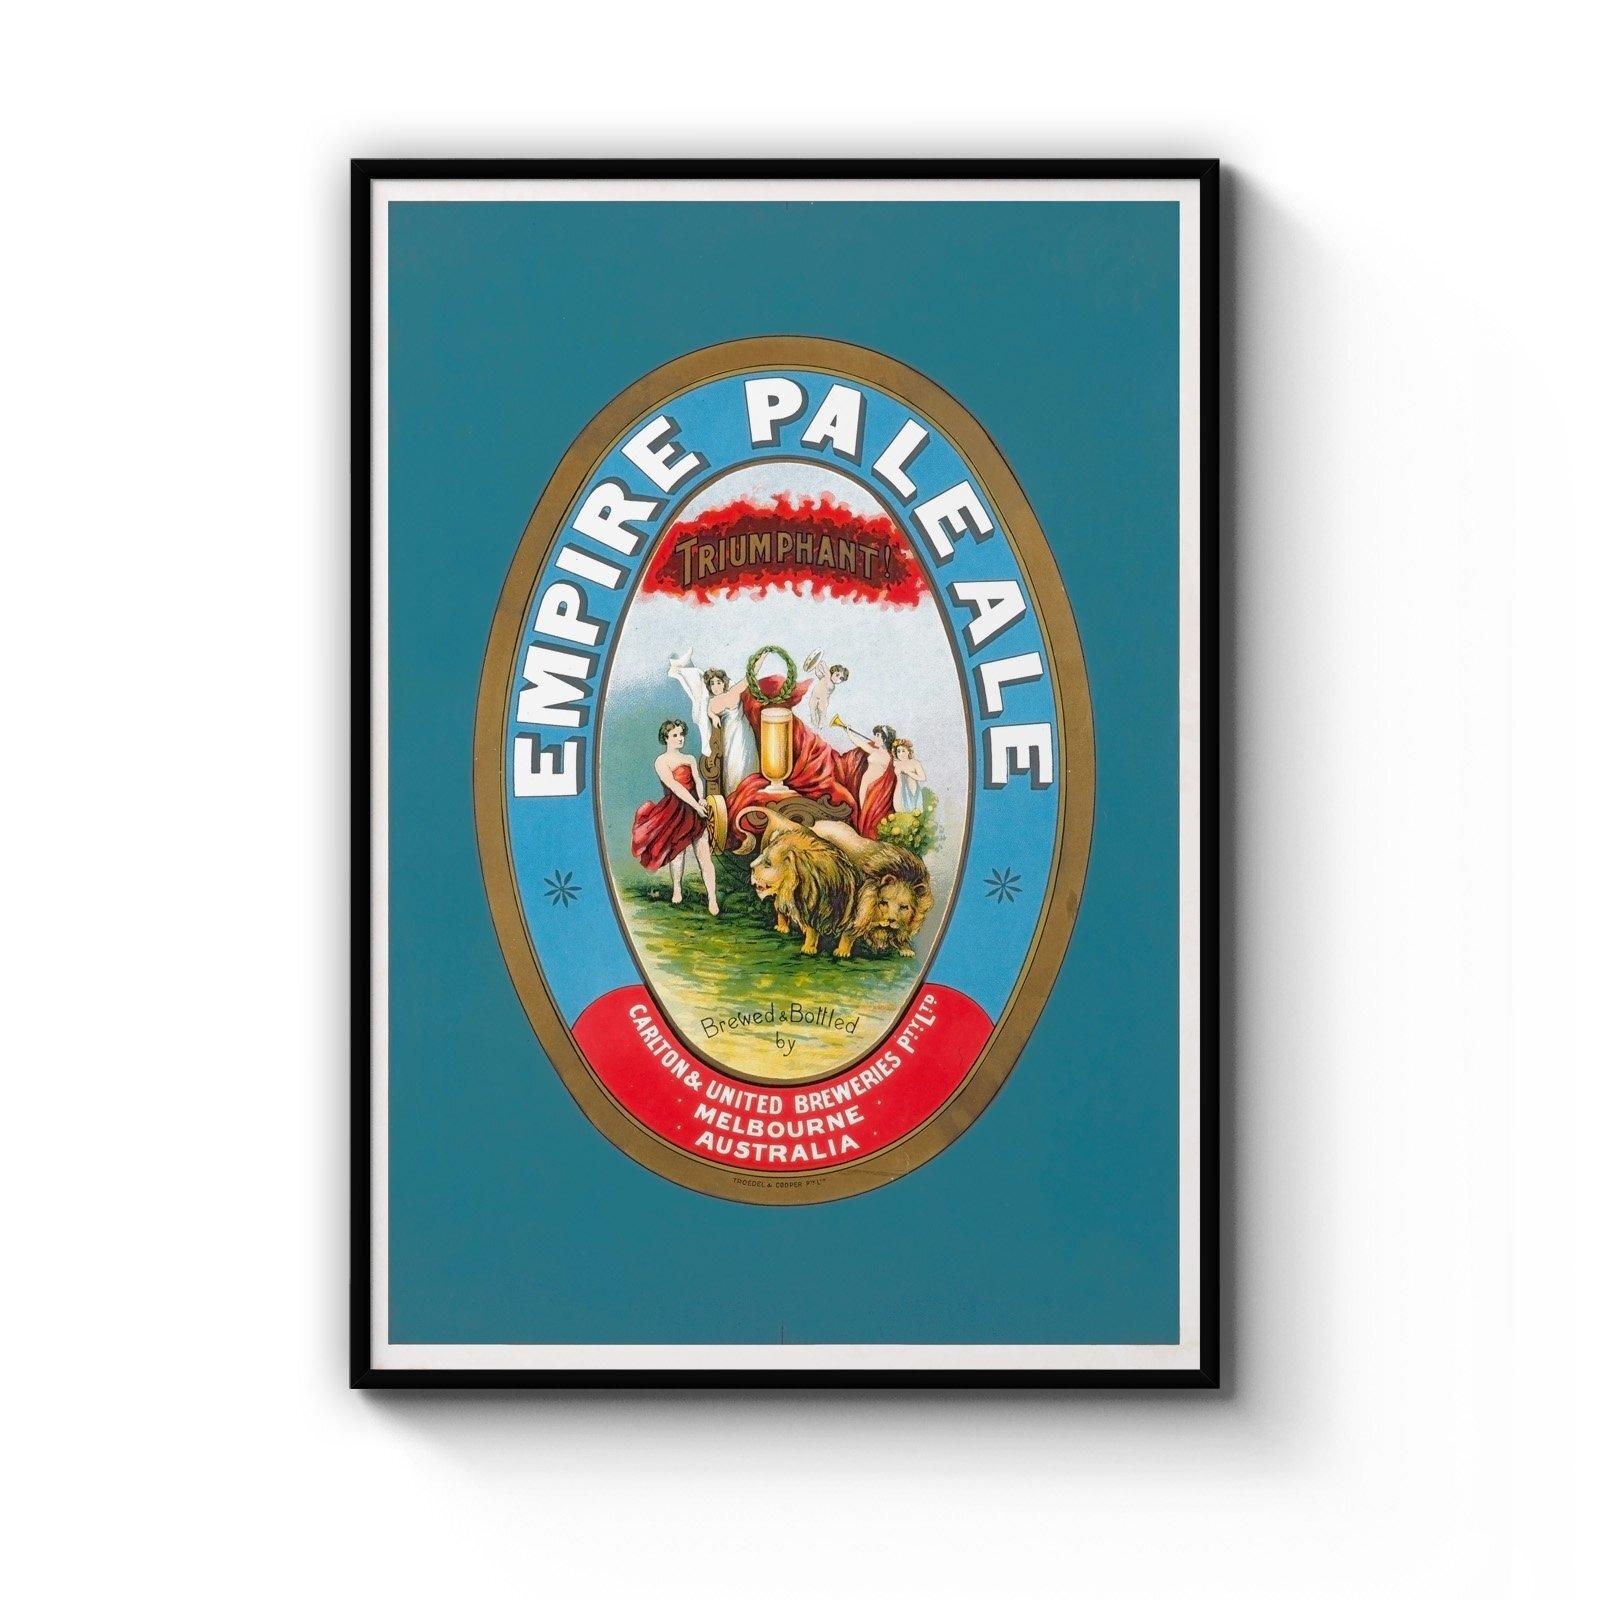 Empire Pale Ale Brewery Vintage Beer Wall Art